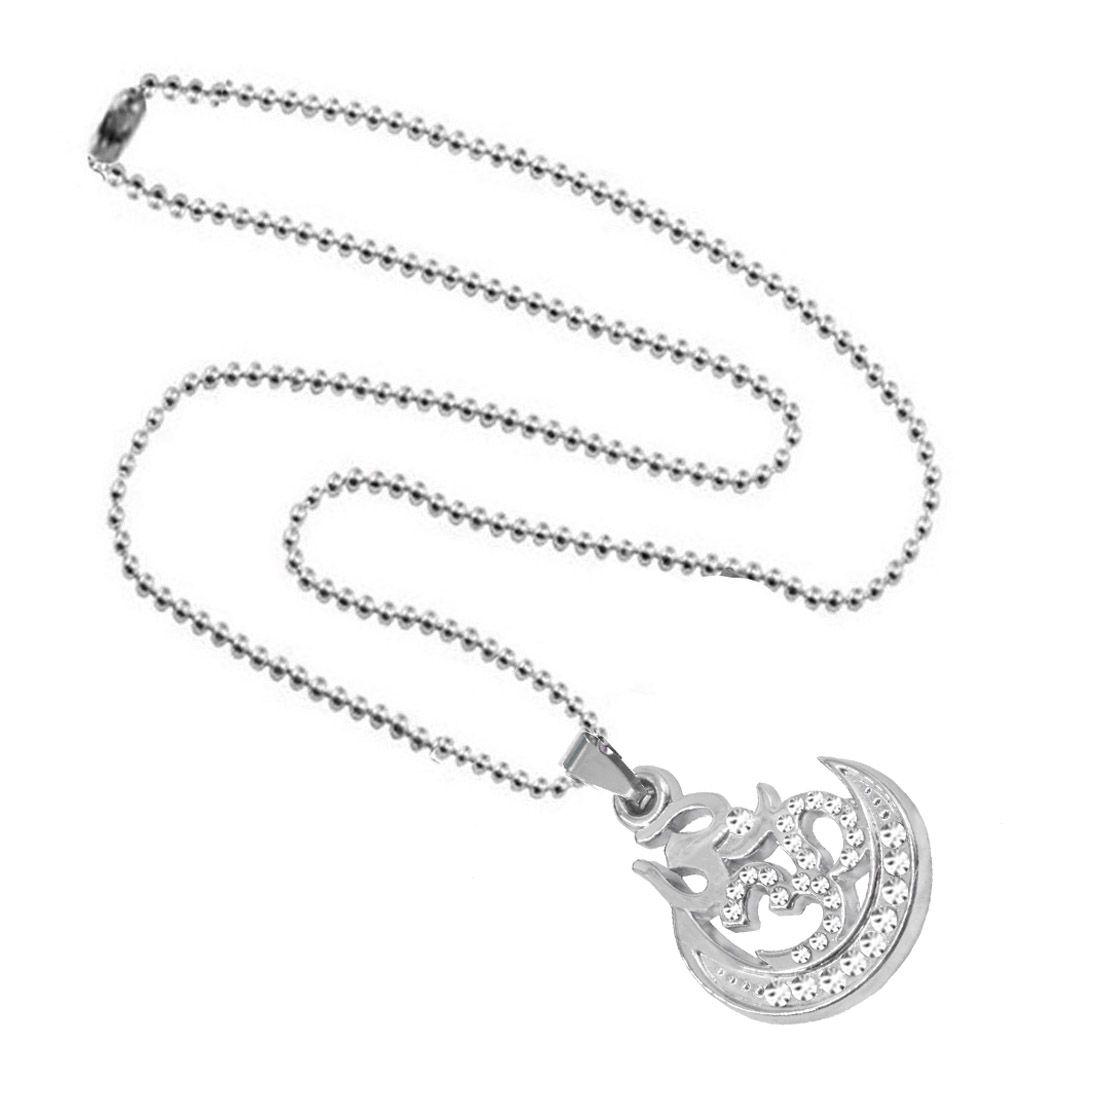 Shiv Jagdamba Religious Jewellery Crescent Moon Cubic Zirconium OM Trishul locket With ChainFor Men Boys